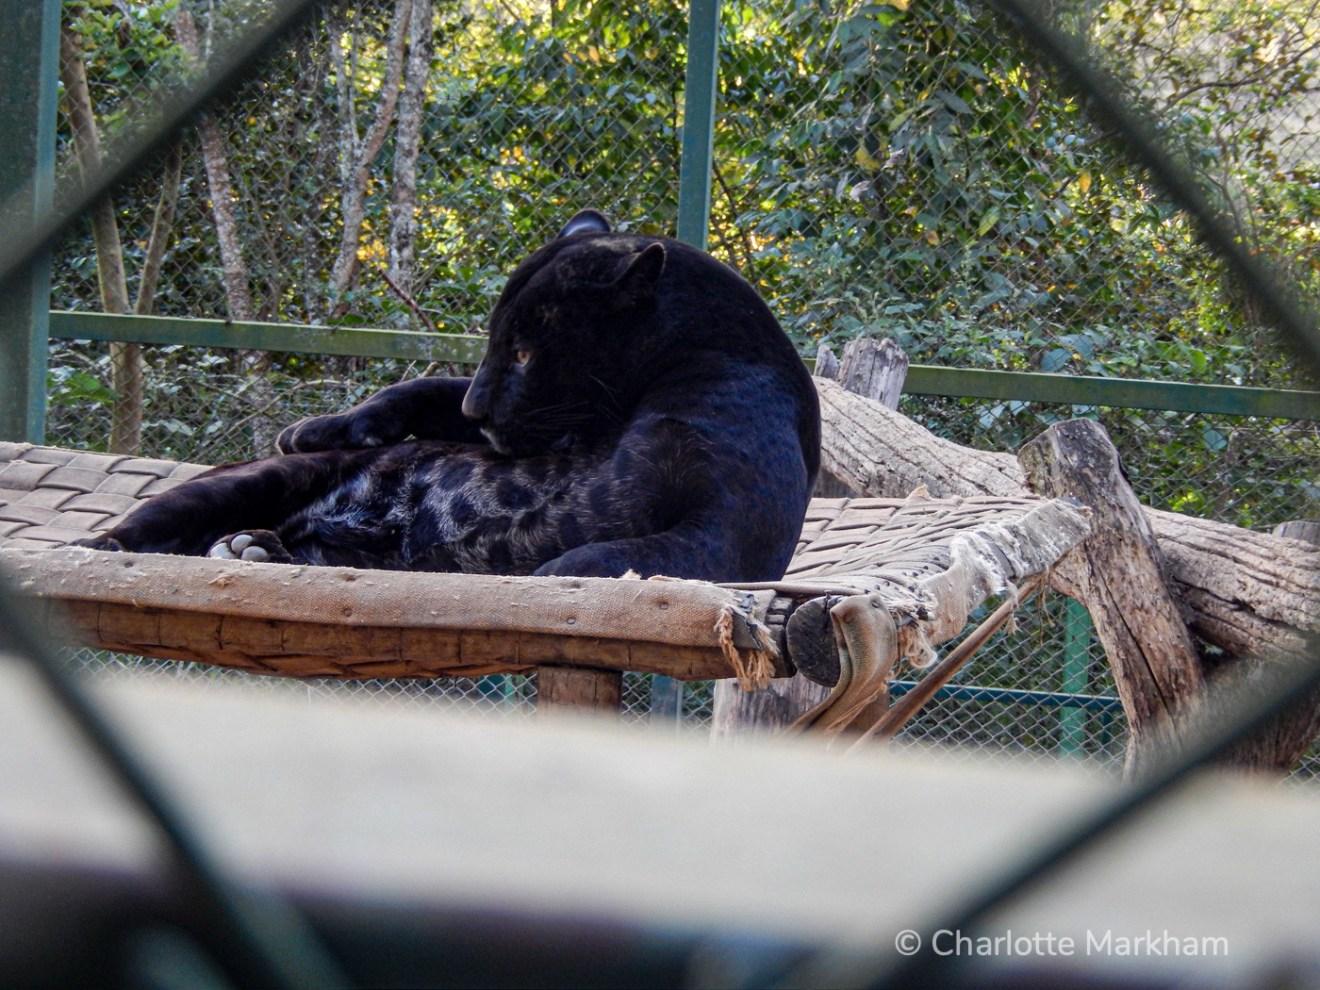 Black jaguars or pantha in Nex No Extinction facility.